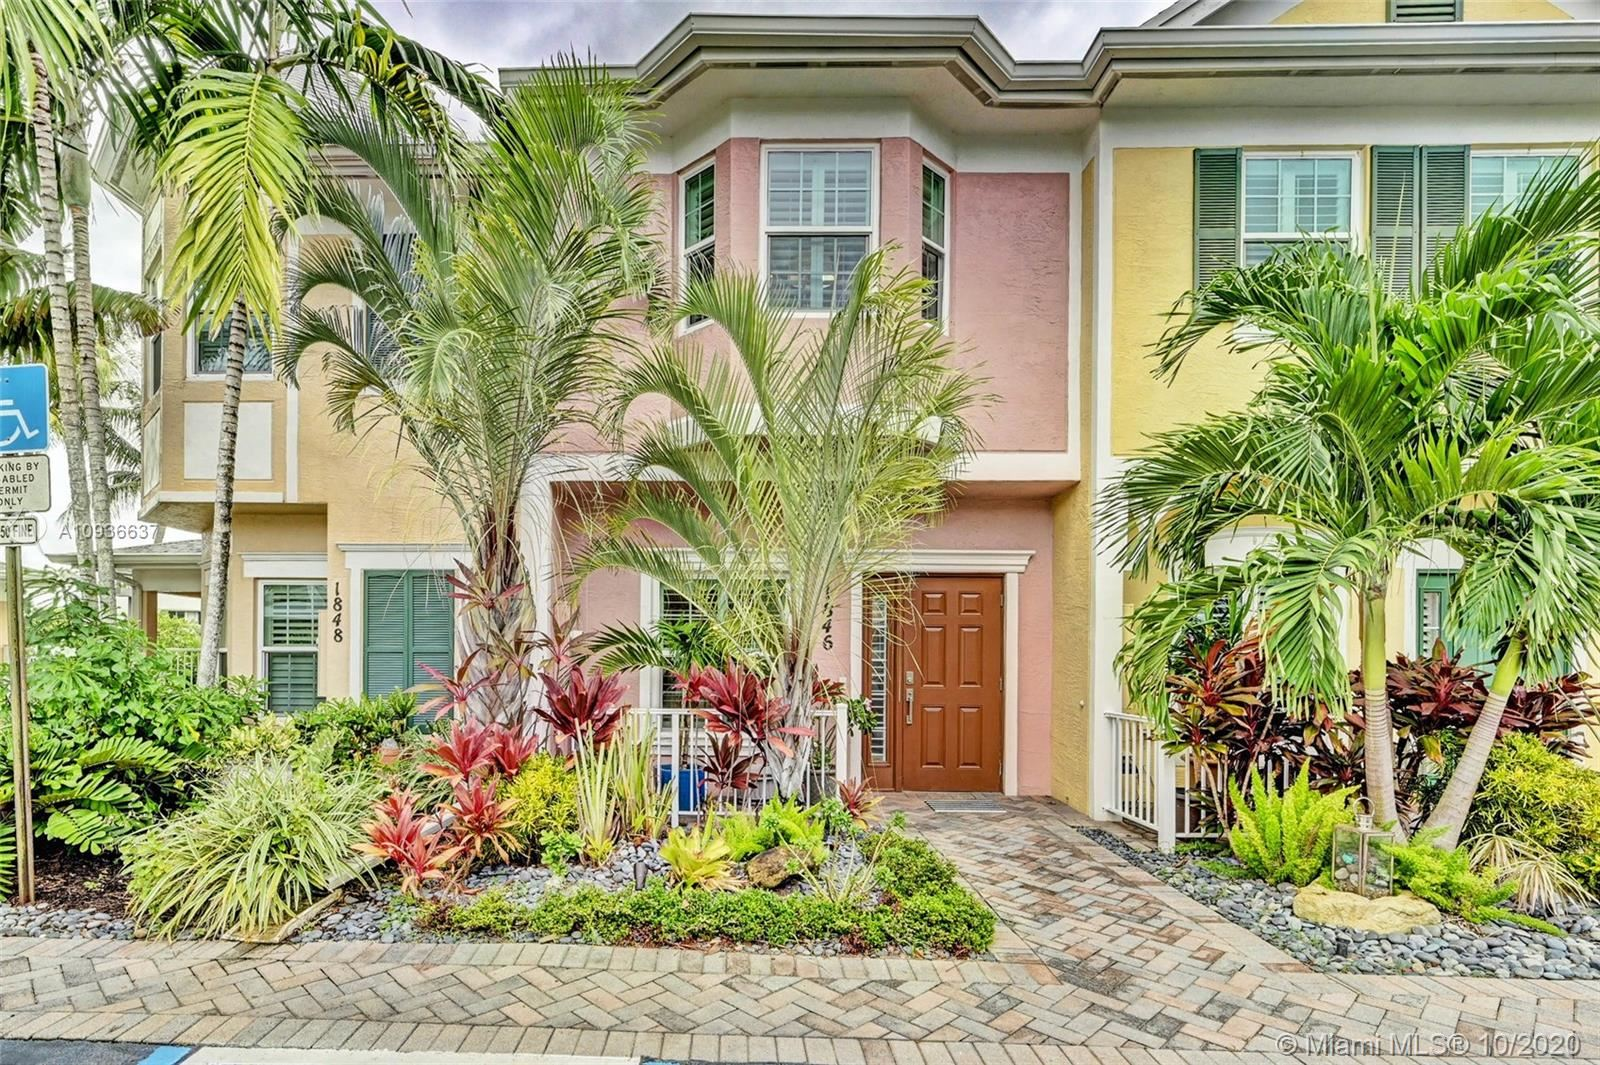 1846 N Dixie Hwy #1846, Fort Lauderdale, FL 33305 - #: A10936637